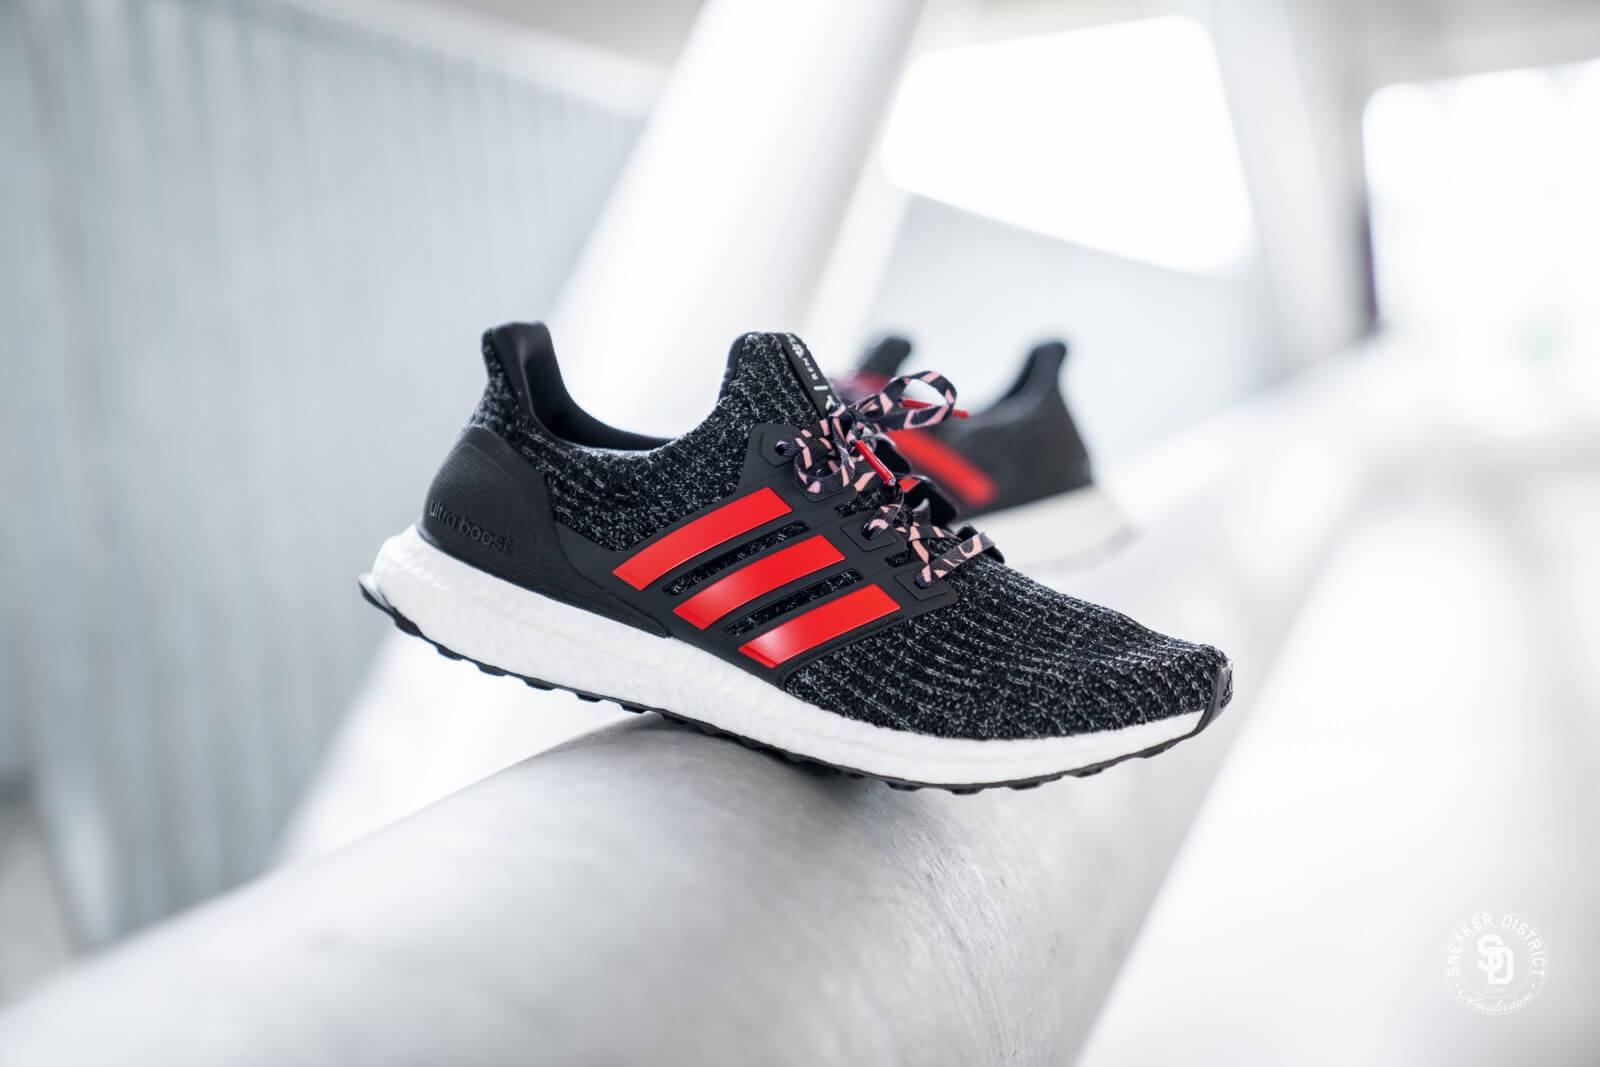 Adidas x Renzhe Ultra Boost CNY Black